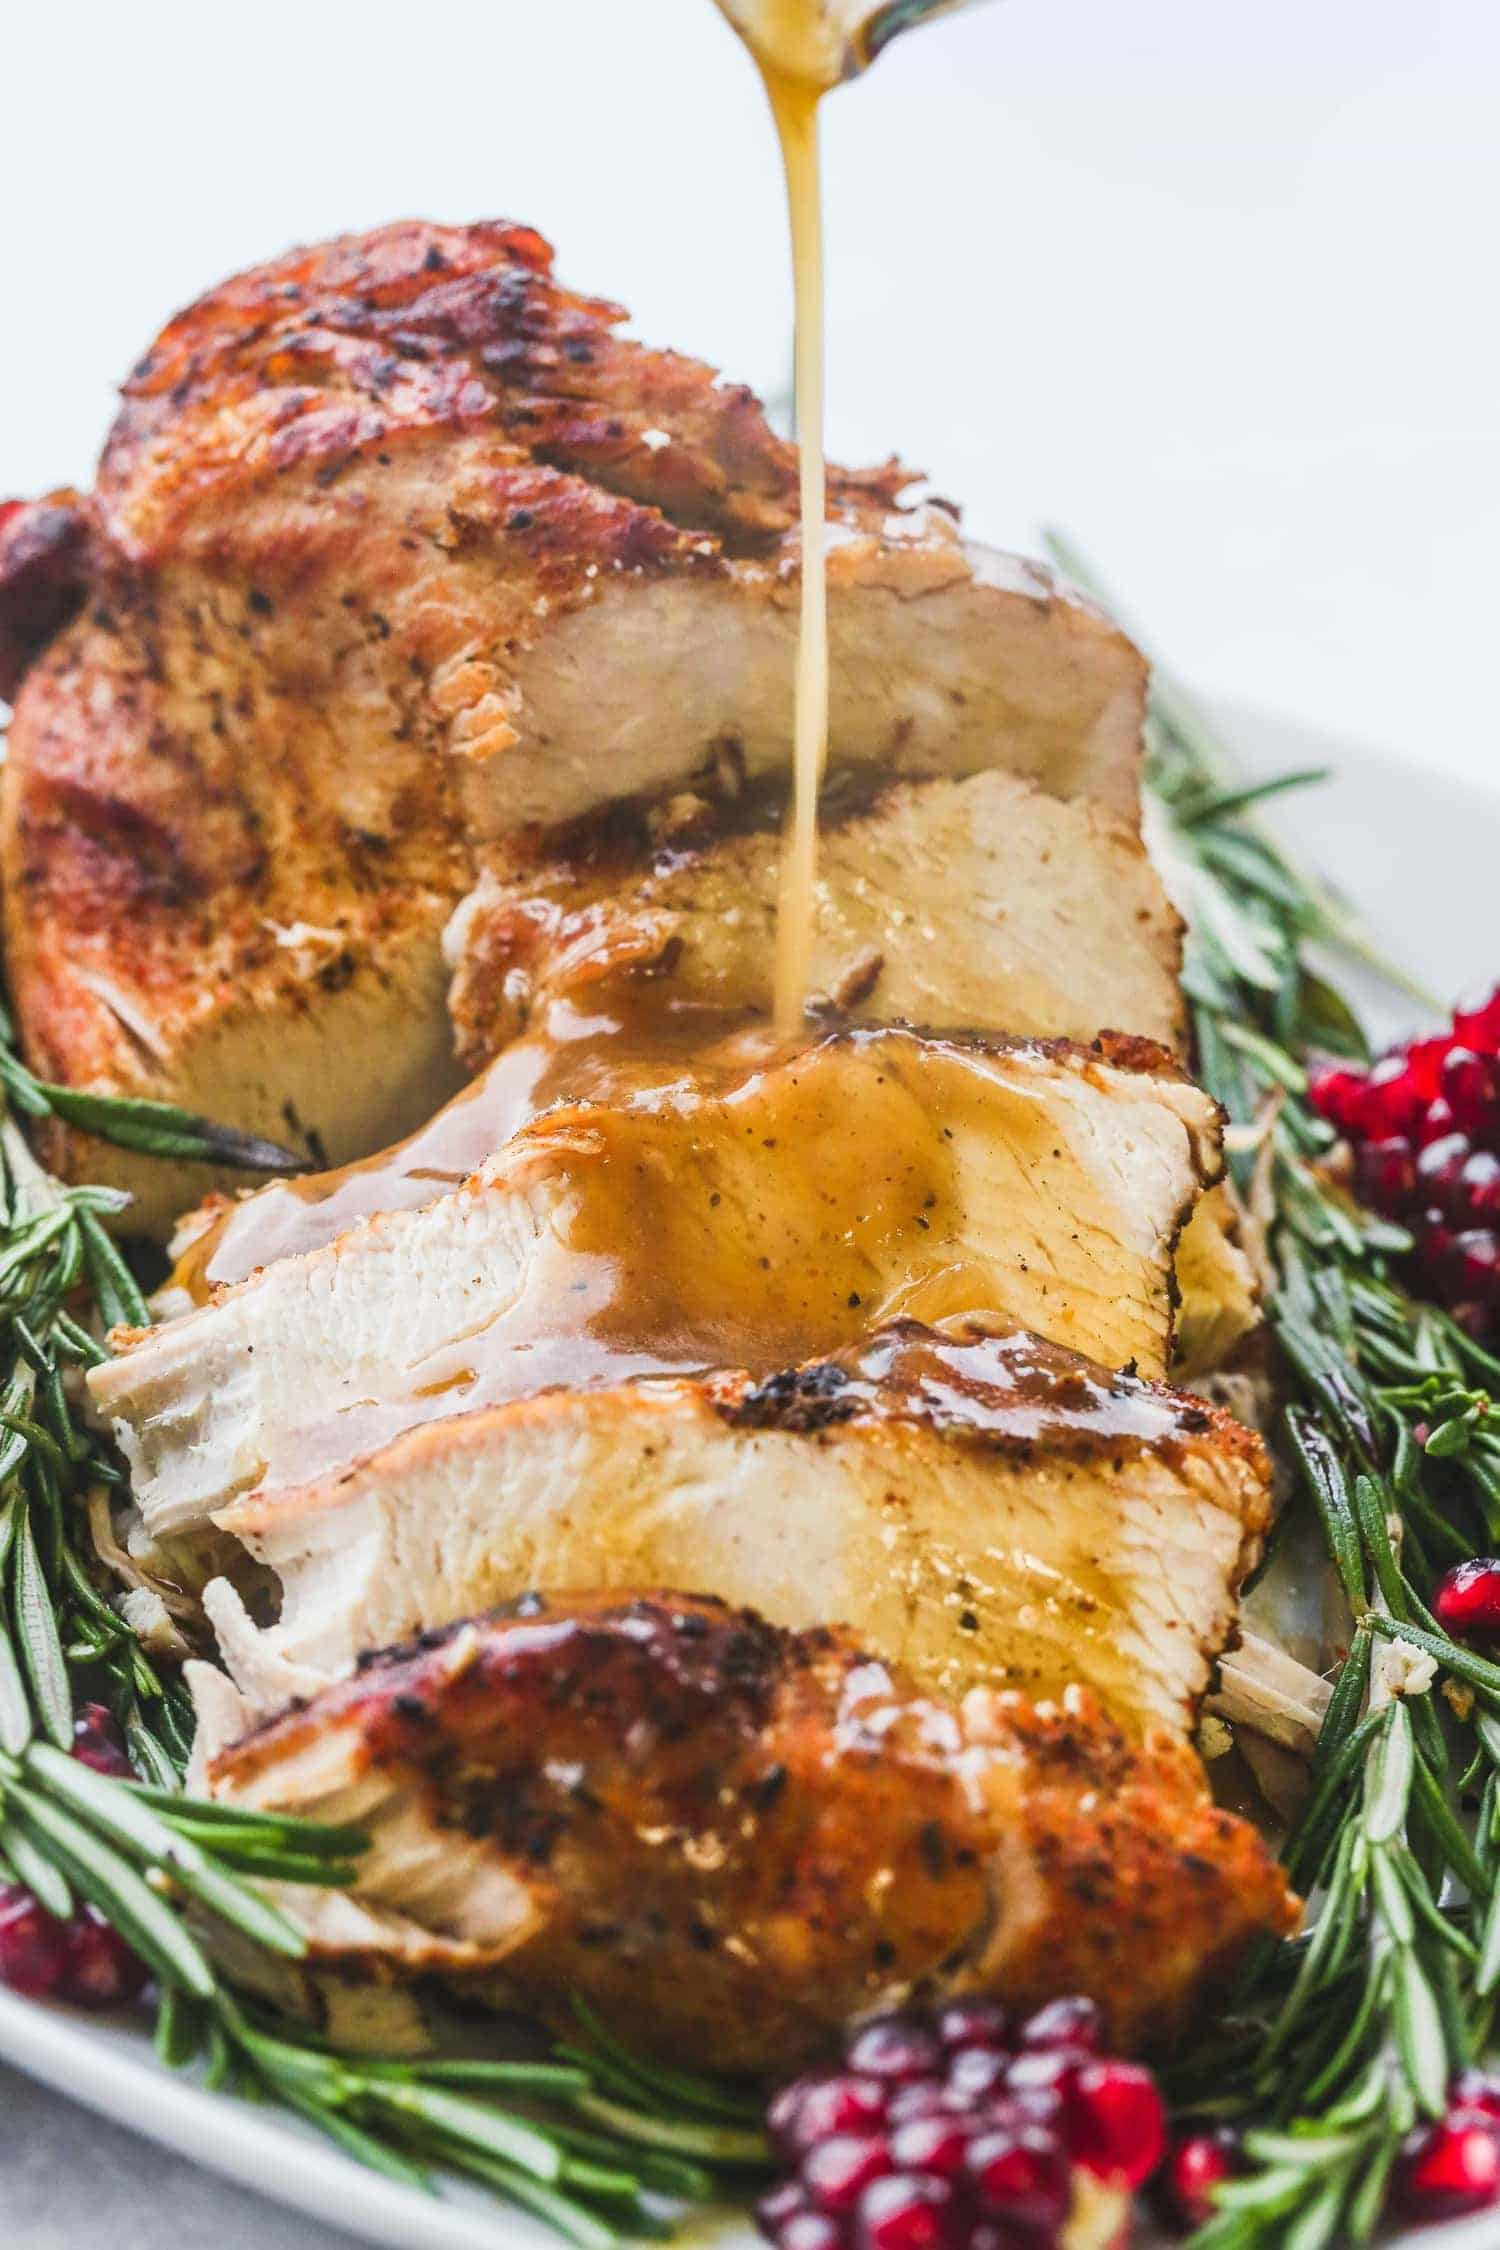 Pouring homemade turkey gravy over  sliced instant pot turkey breast